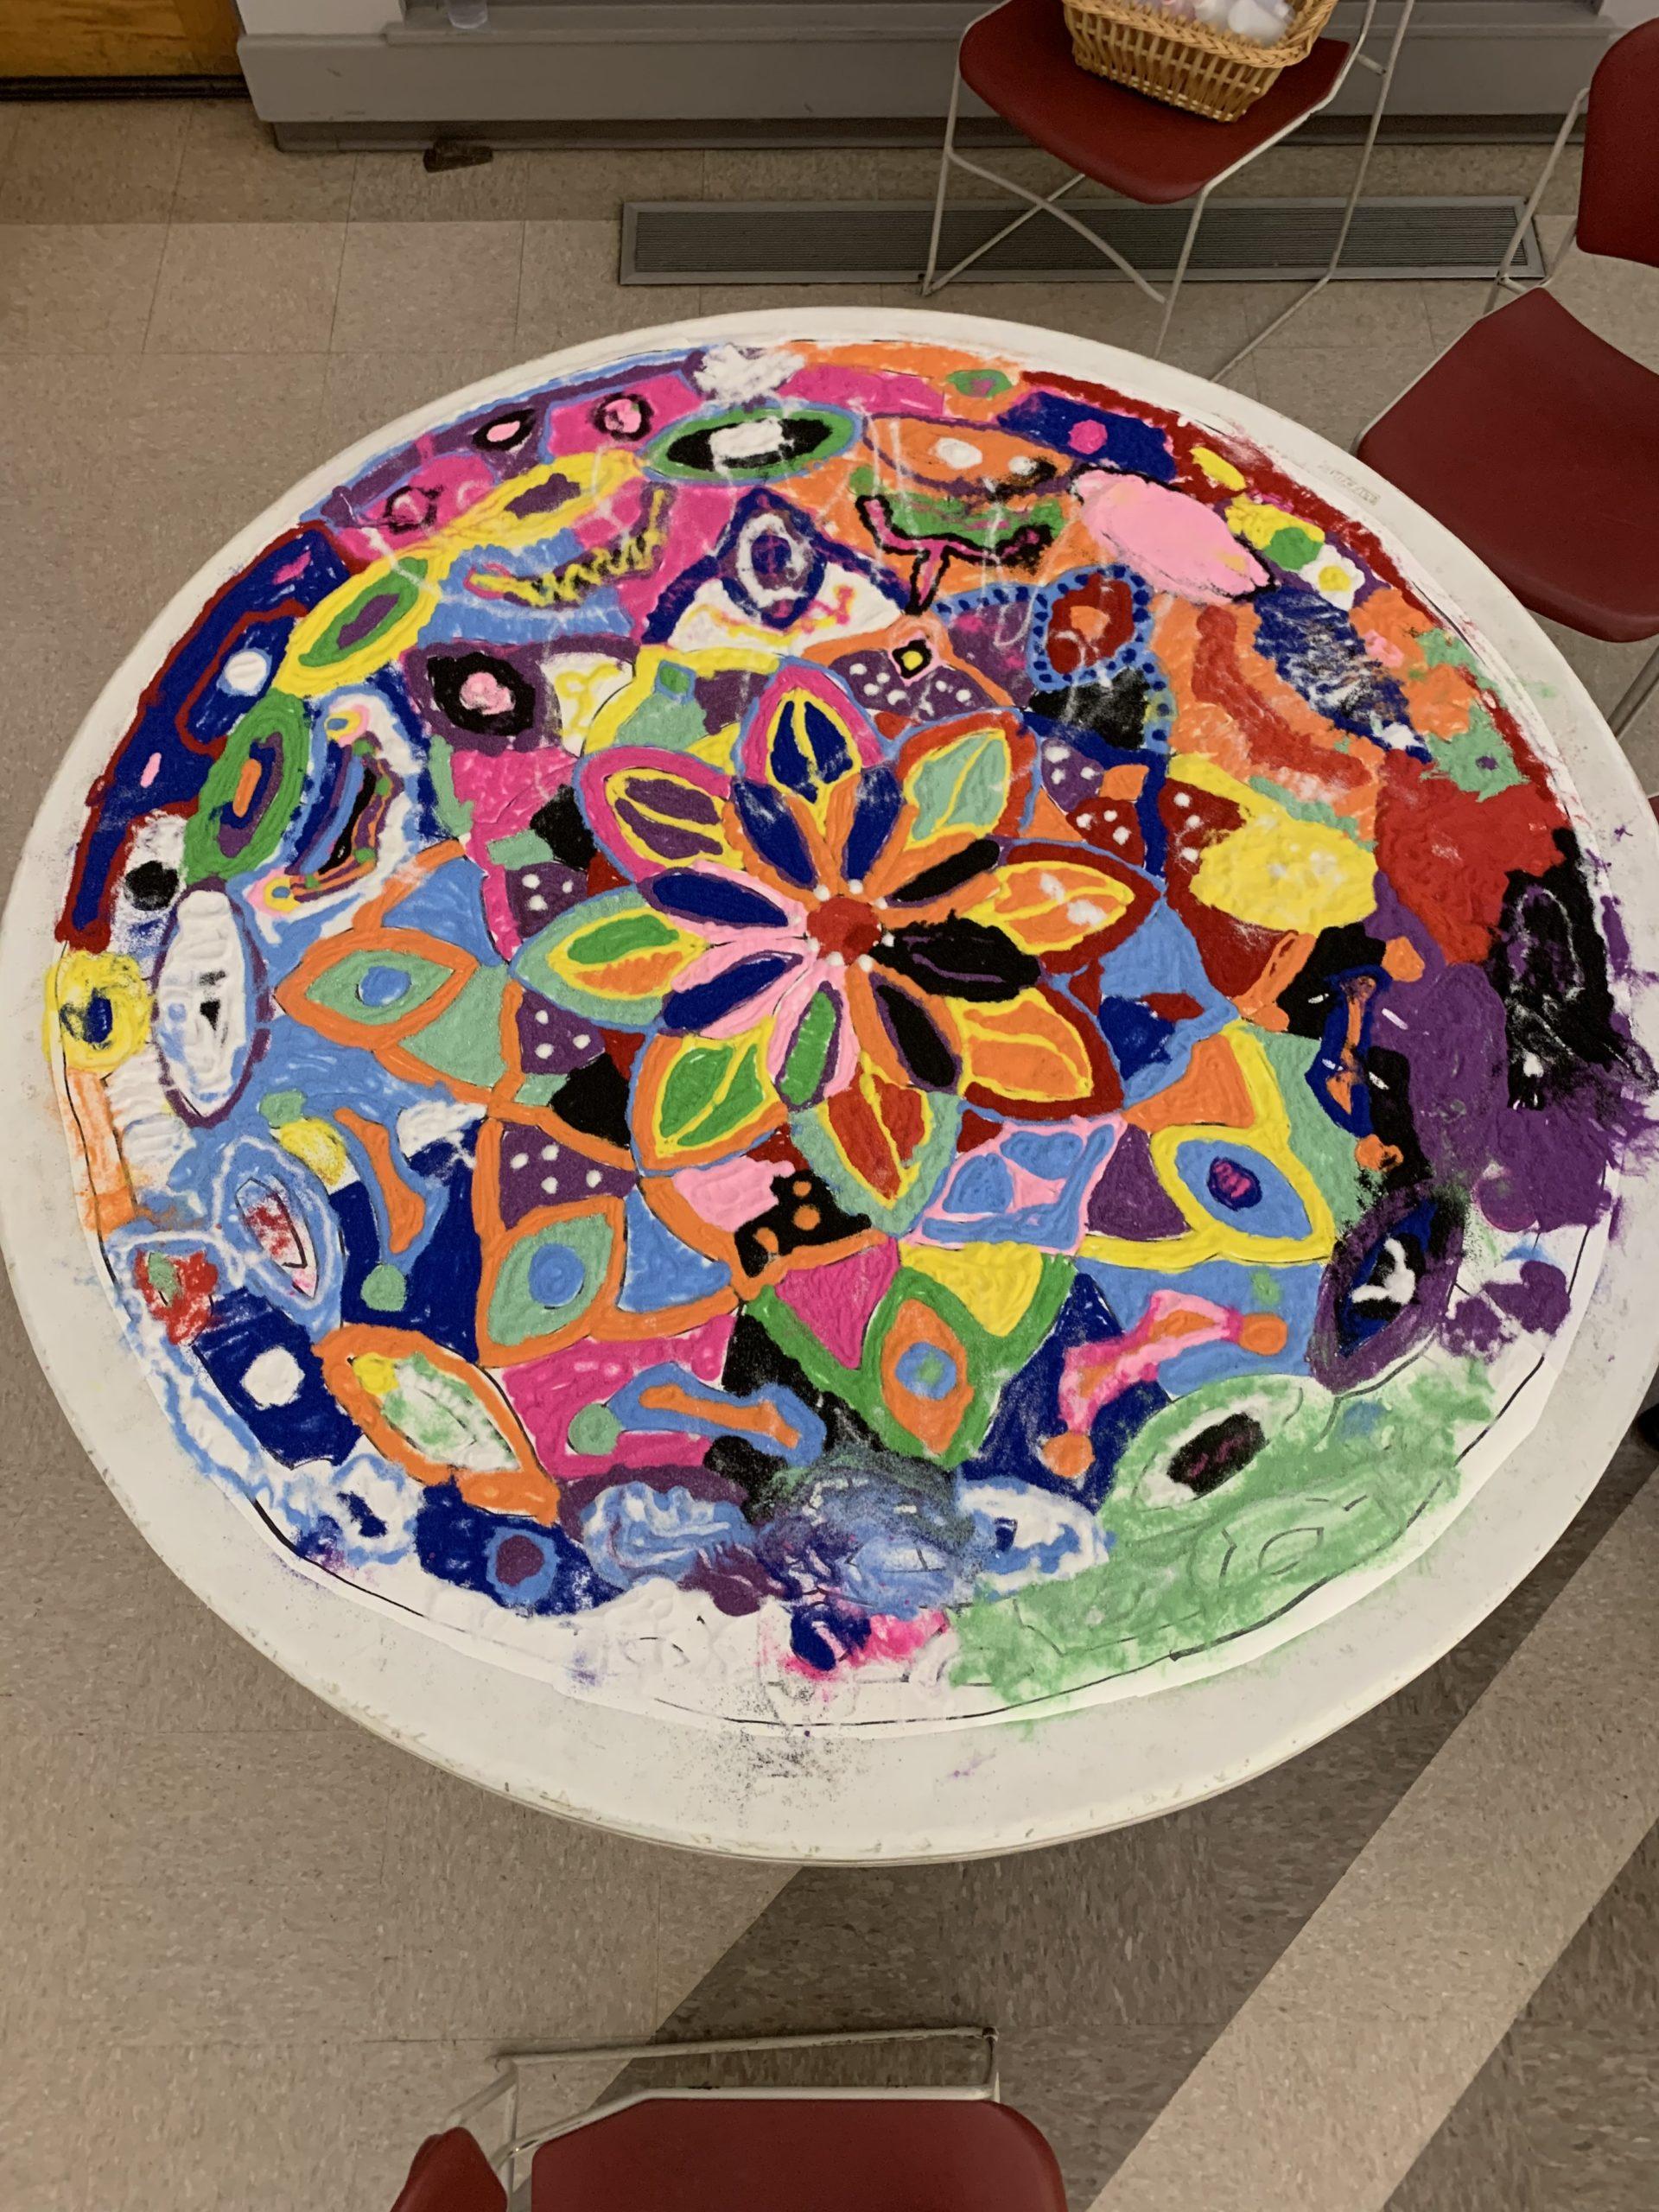 Creating Meditative Space with A Sand Mandala